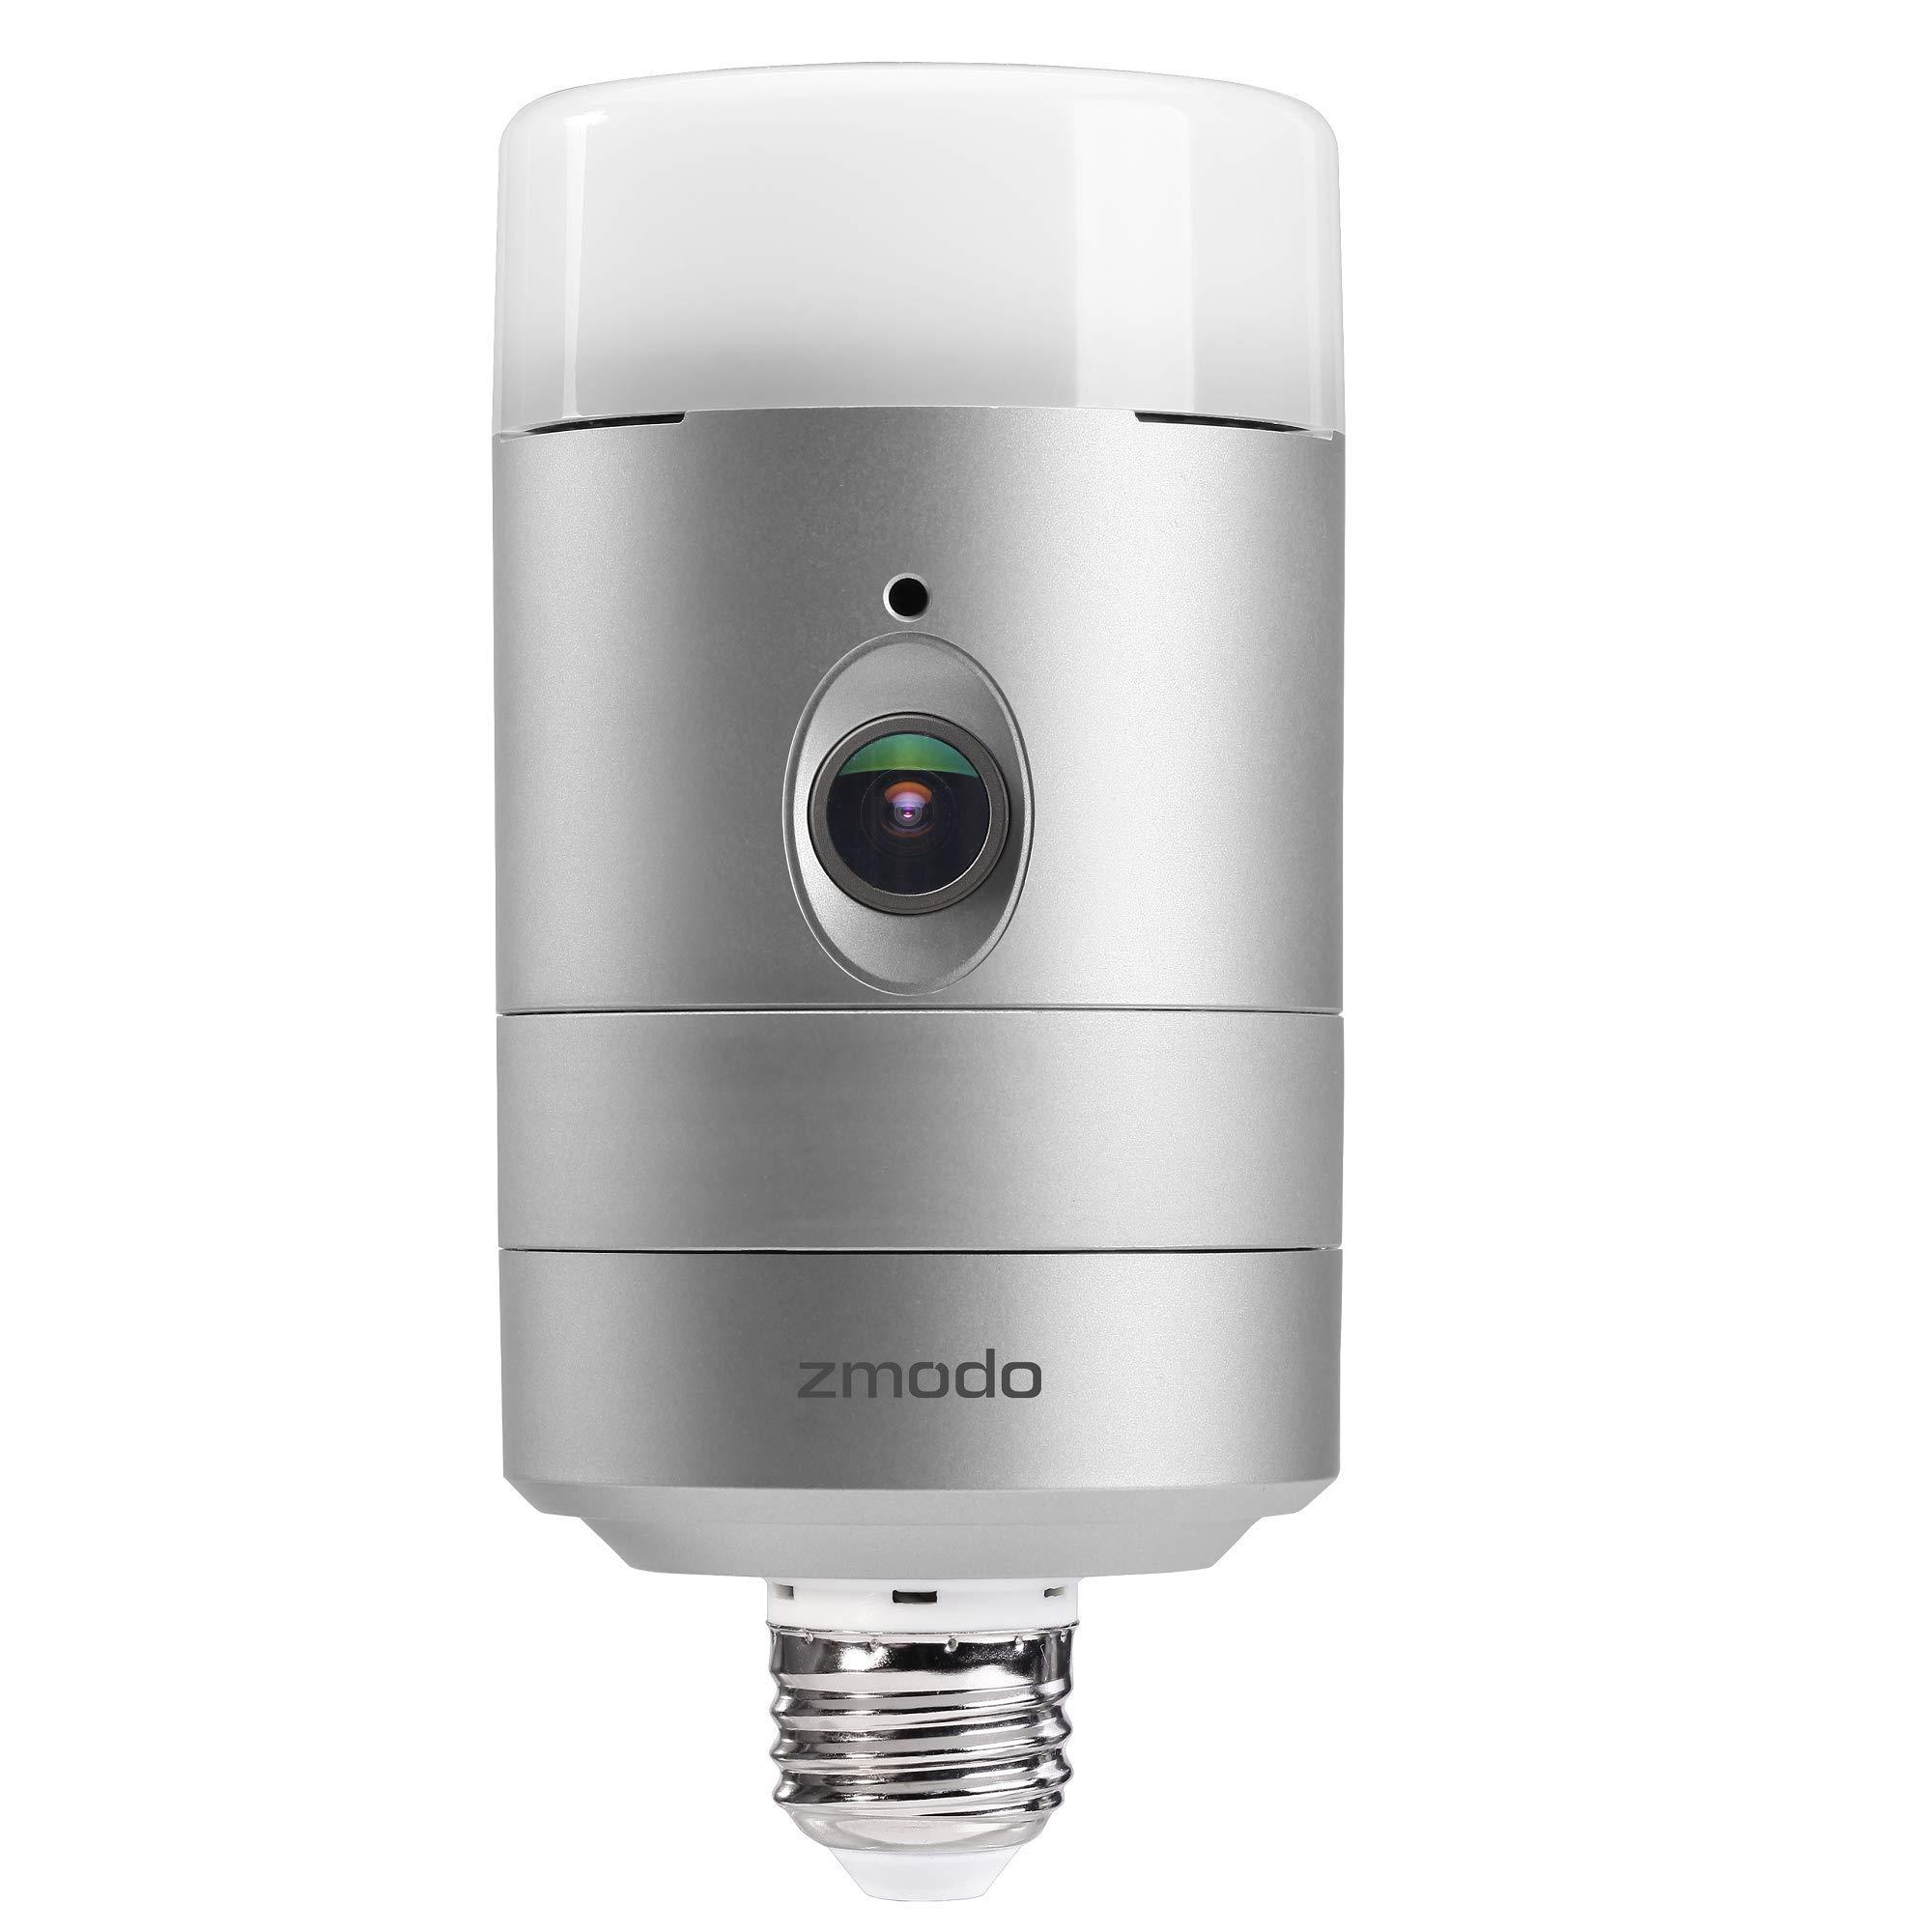 Zmodo Torch 360 Smart Home Door Light Wireless, Silver (SD-H2103)